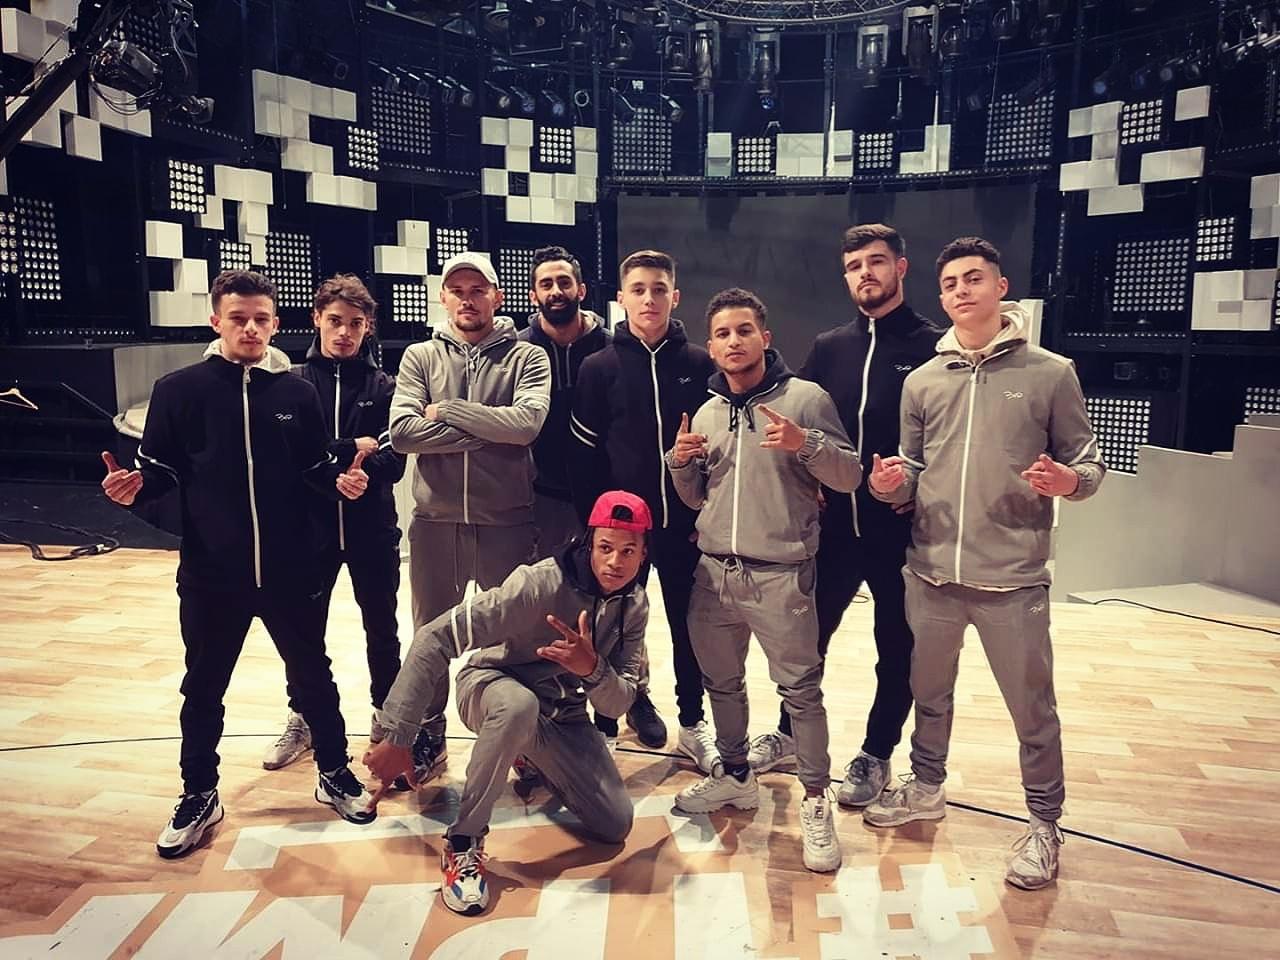 Groupe danseurs